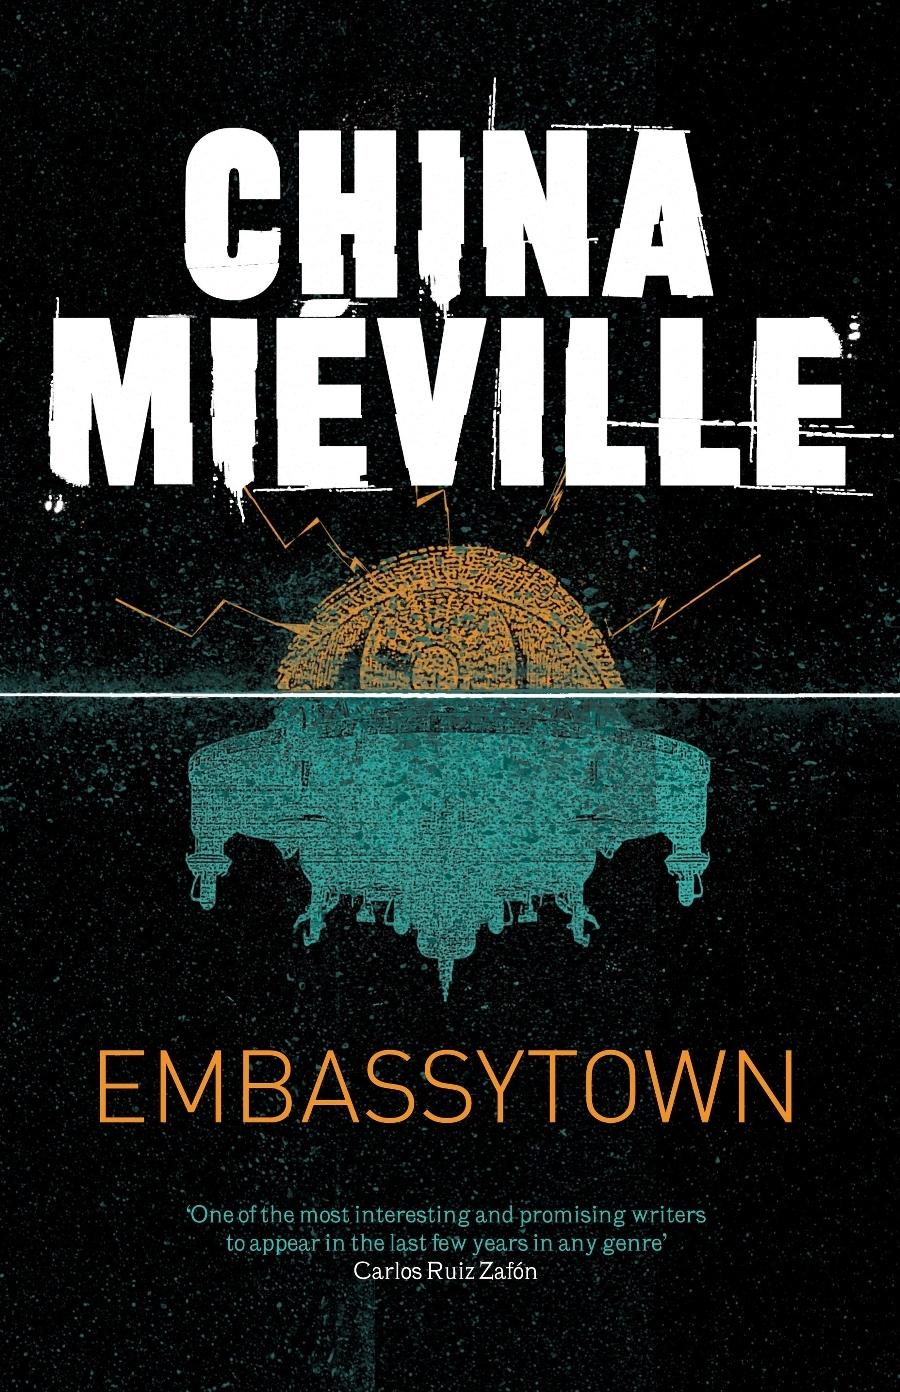 embassytown1.jpg